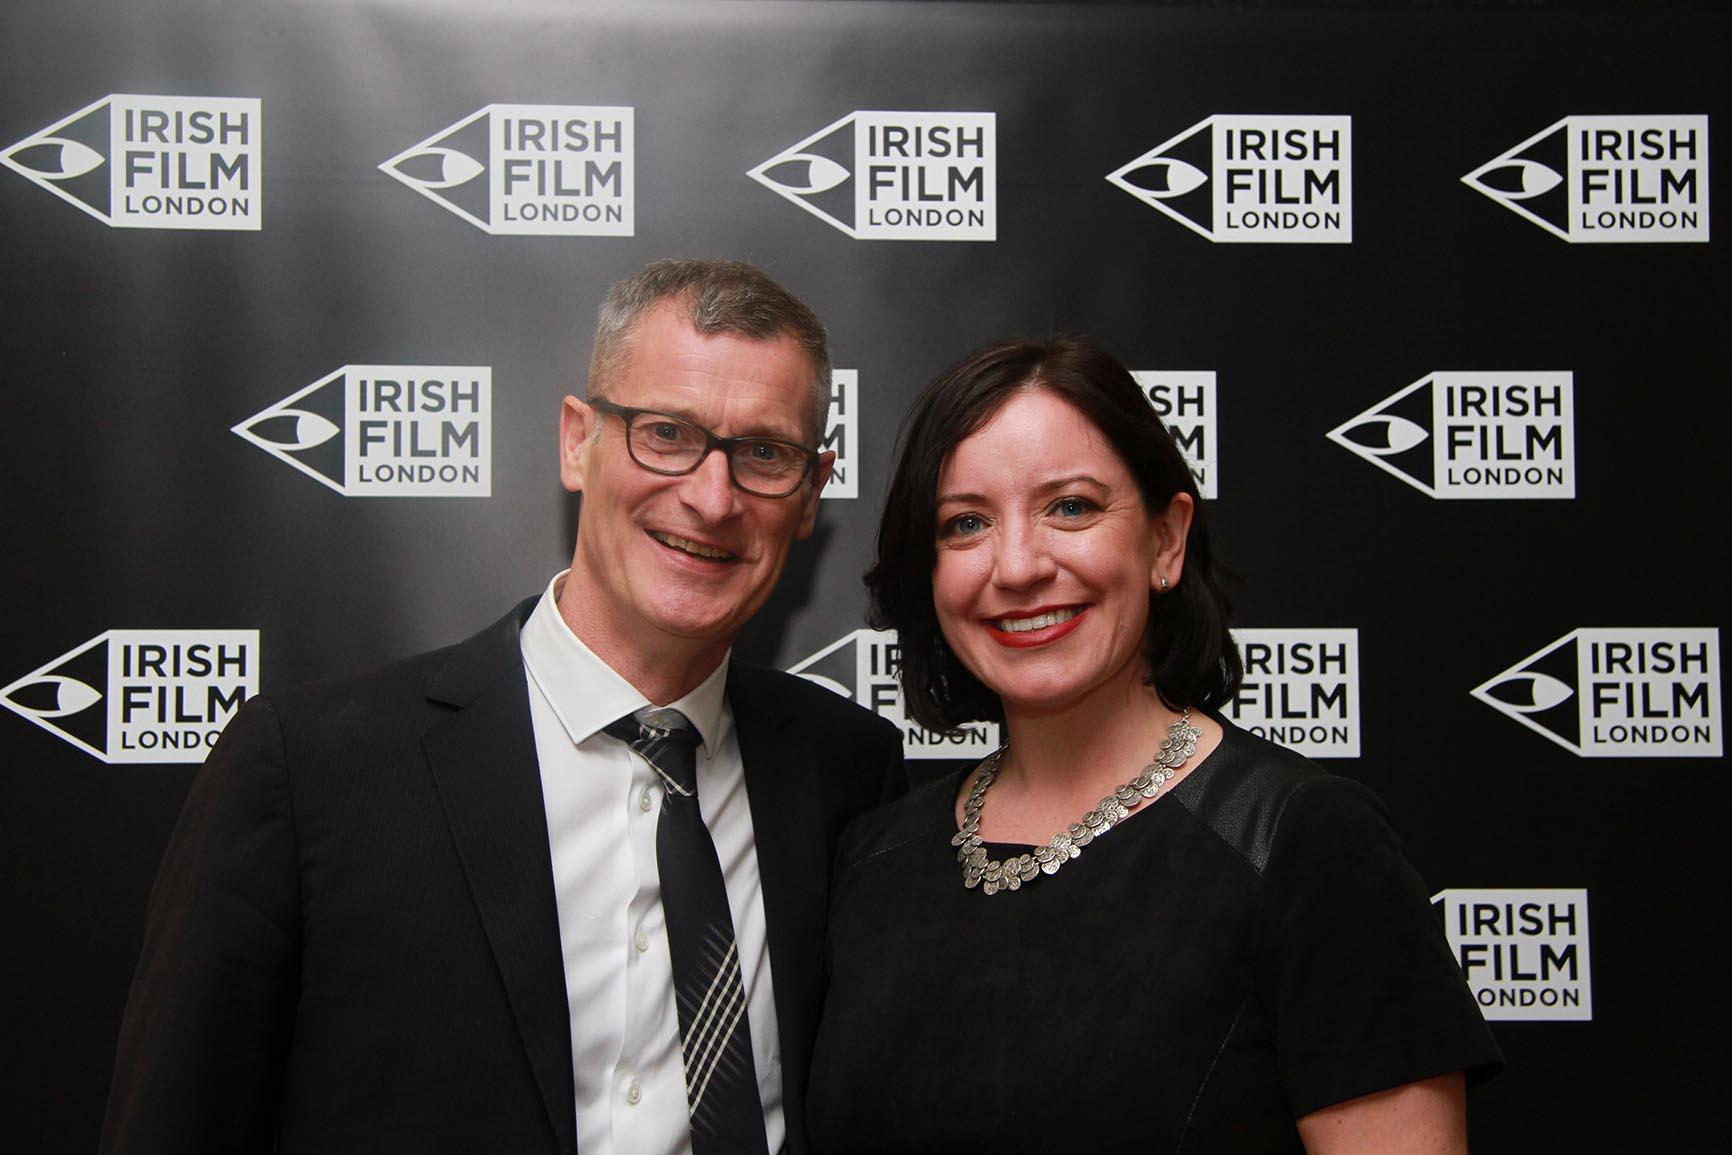 Irish Film London Directors Professor Lance Pettitt and Angela Sammon